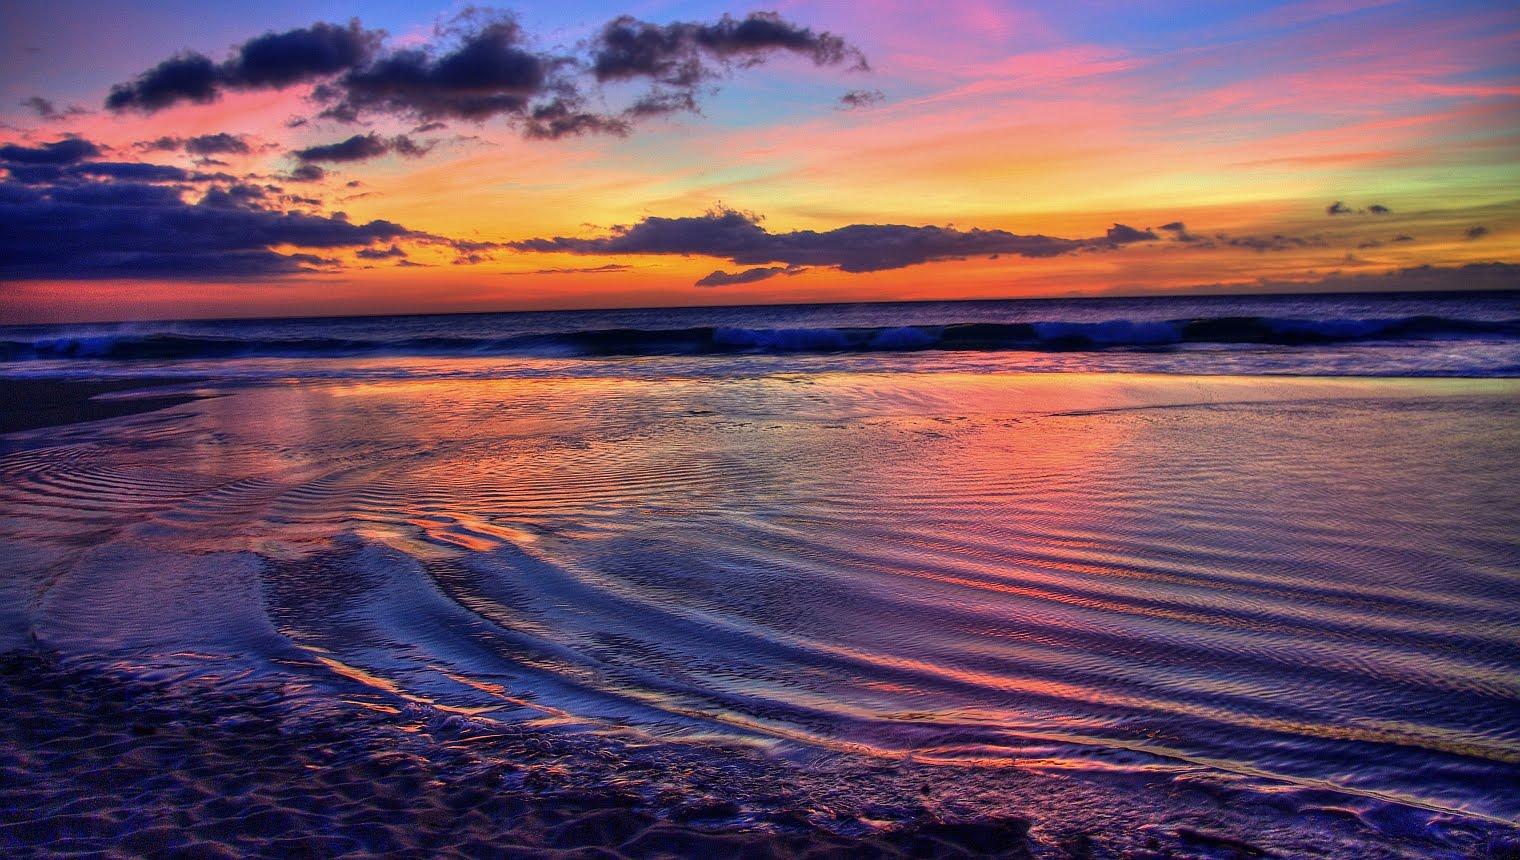 Hawaiian Sunset Wallpaper Hawaiian sunset wallpaper